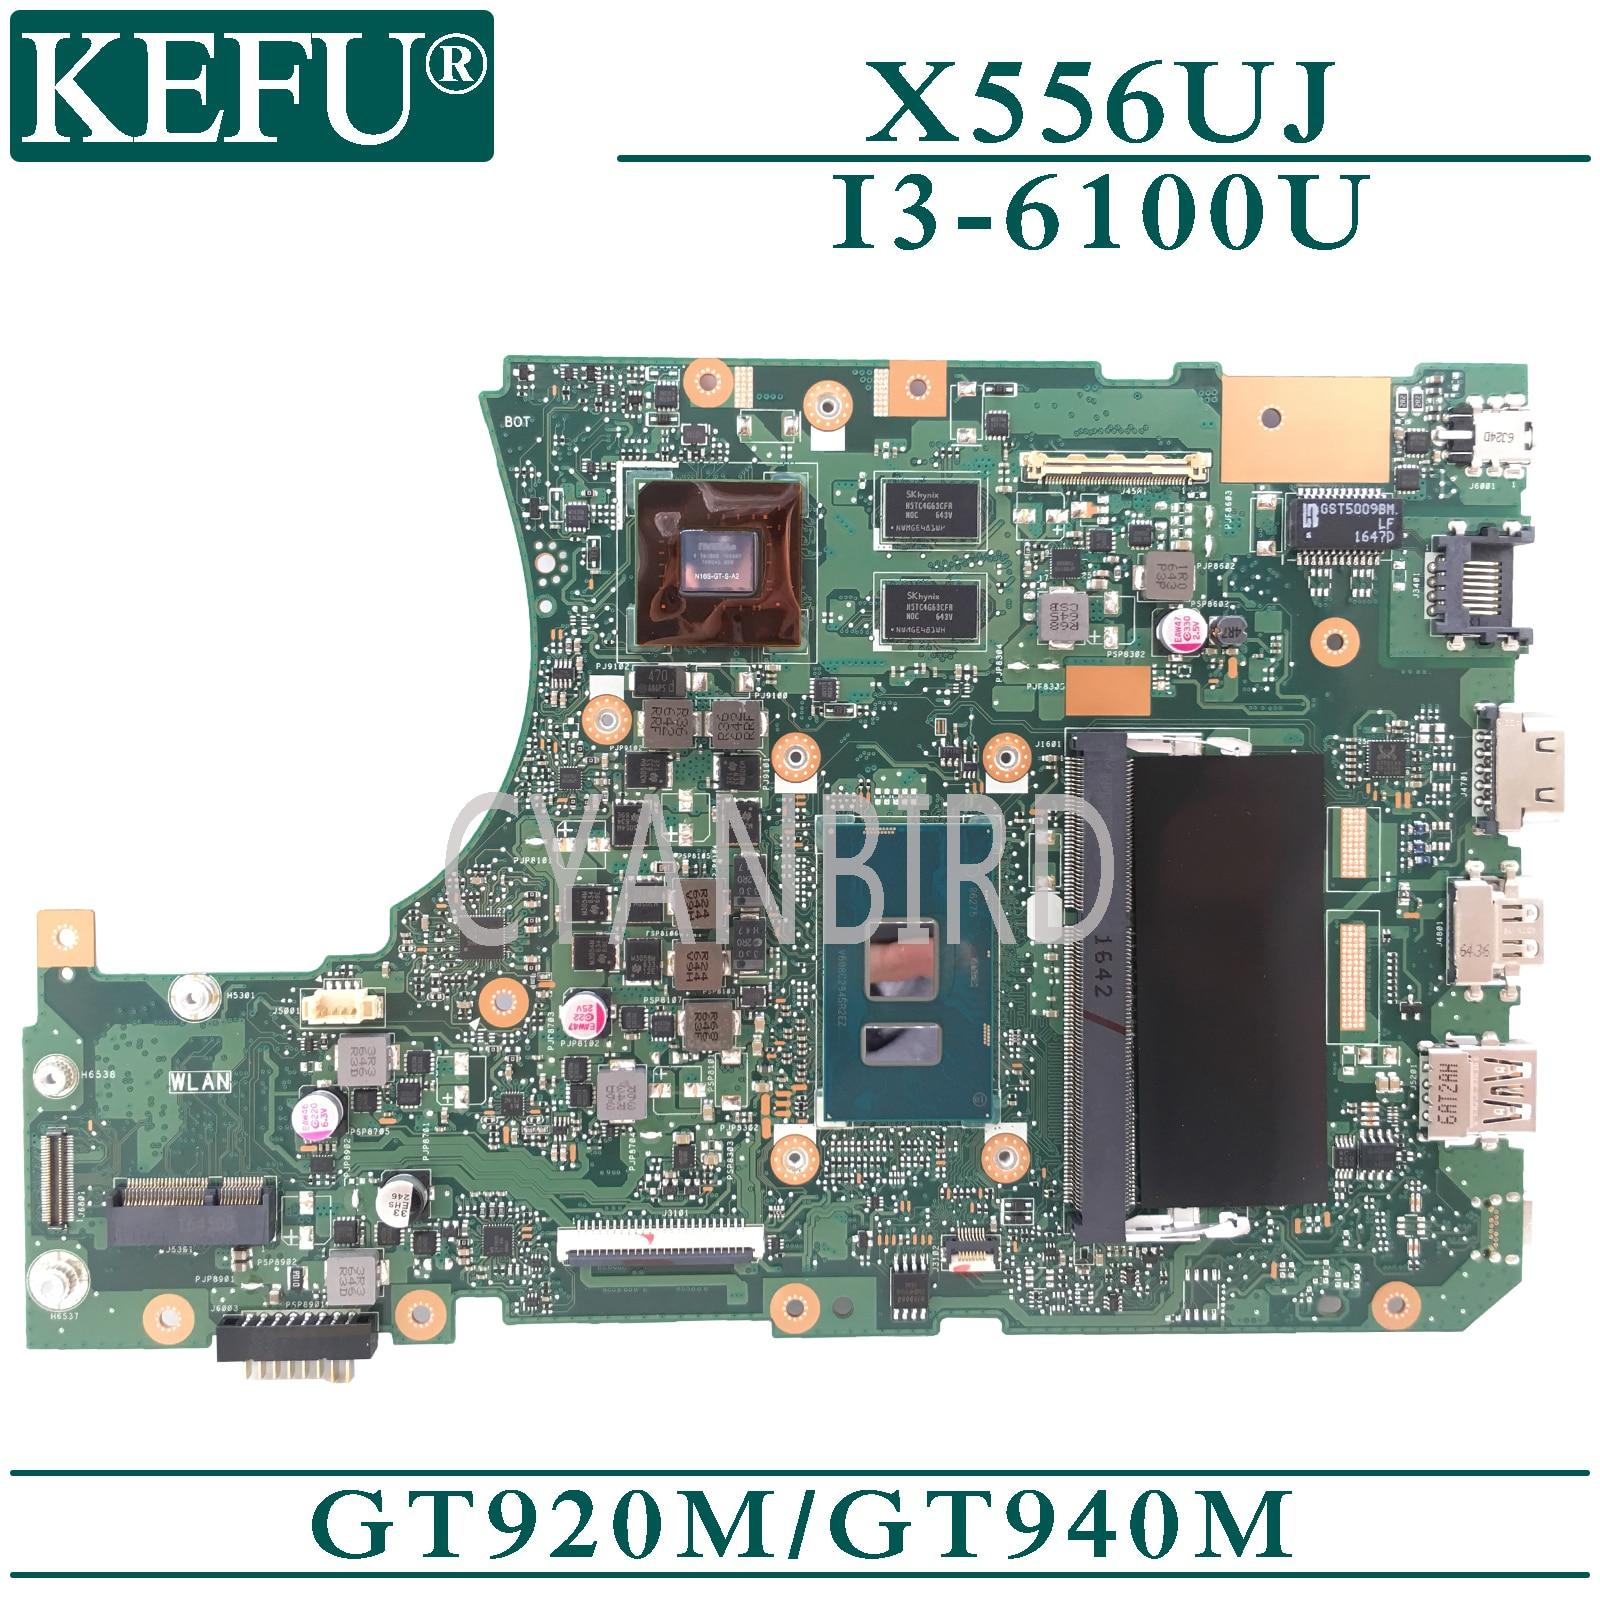 KEFU X556UJ الأصلي اللوحة الرئيسية ل ASUS X556UV X556UF X556UB X556UR مع 4GB-RAM I3-6100U GT920M/940 متر اللوحة الأم للكمبيوتر المحمول